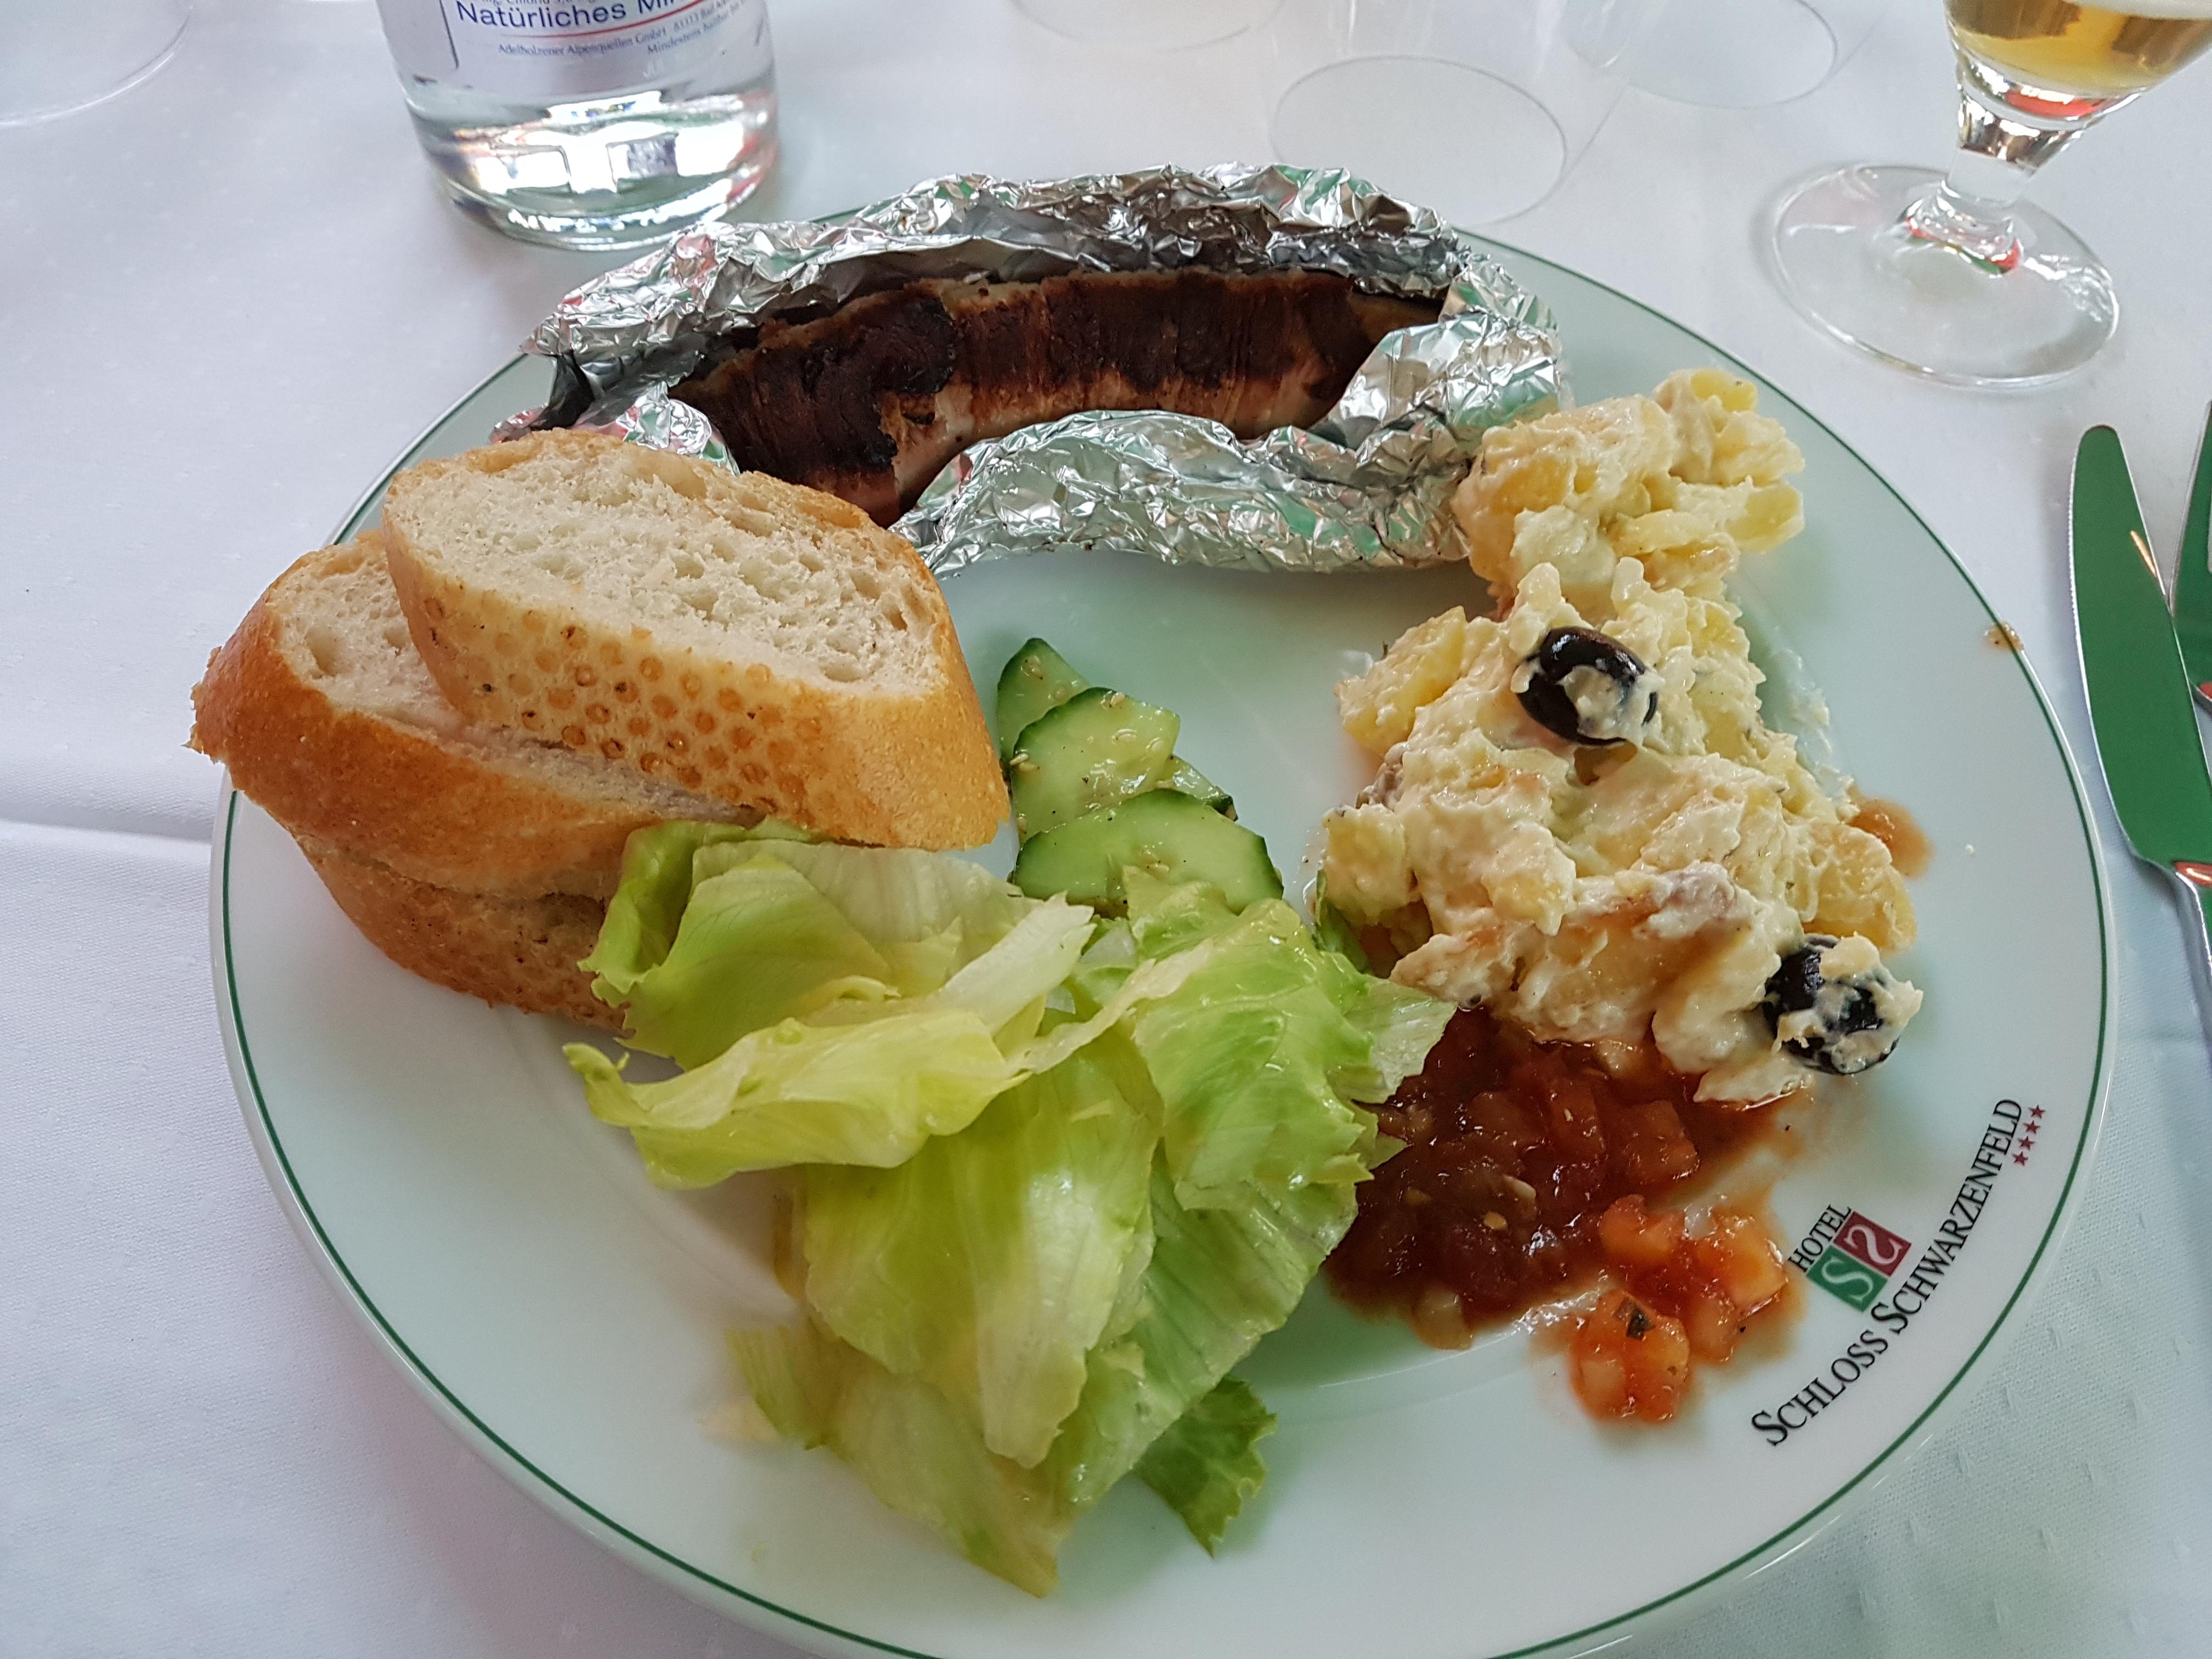 http://foodloader.net/Holz_2017-08-25_Bacon-Chili-Bratwurst_mit_Kartoffelsalat.jpg